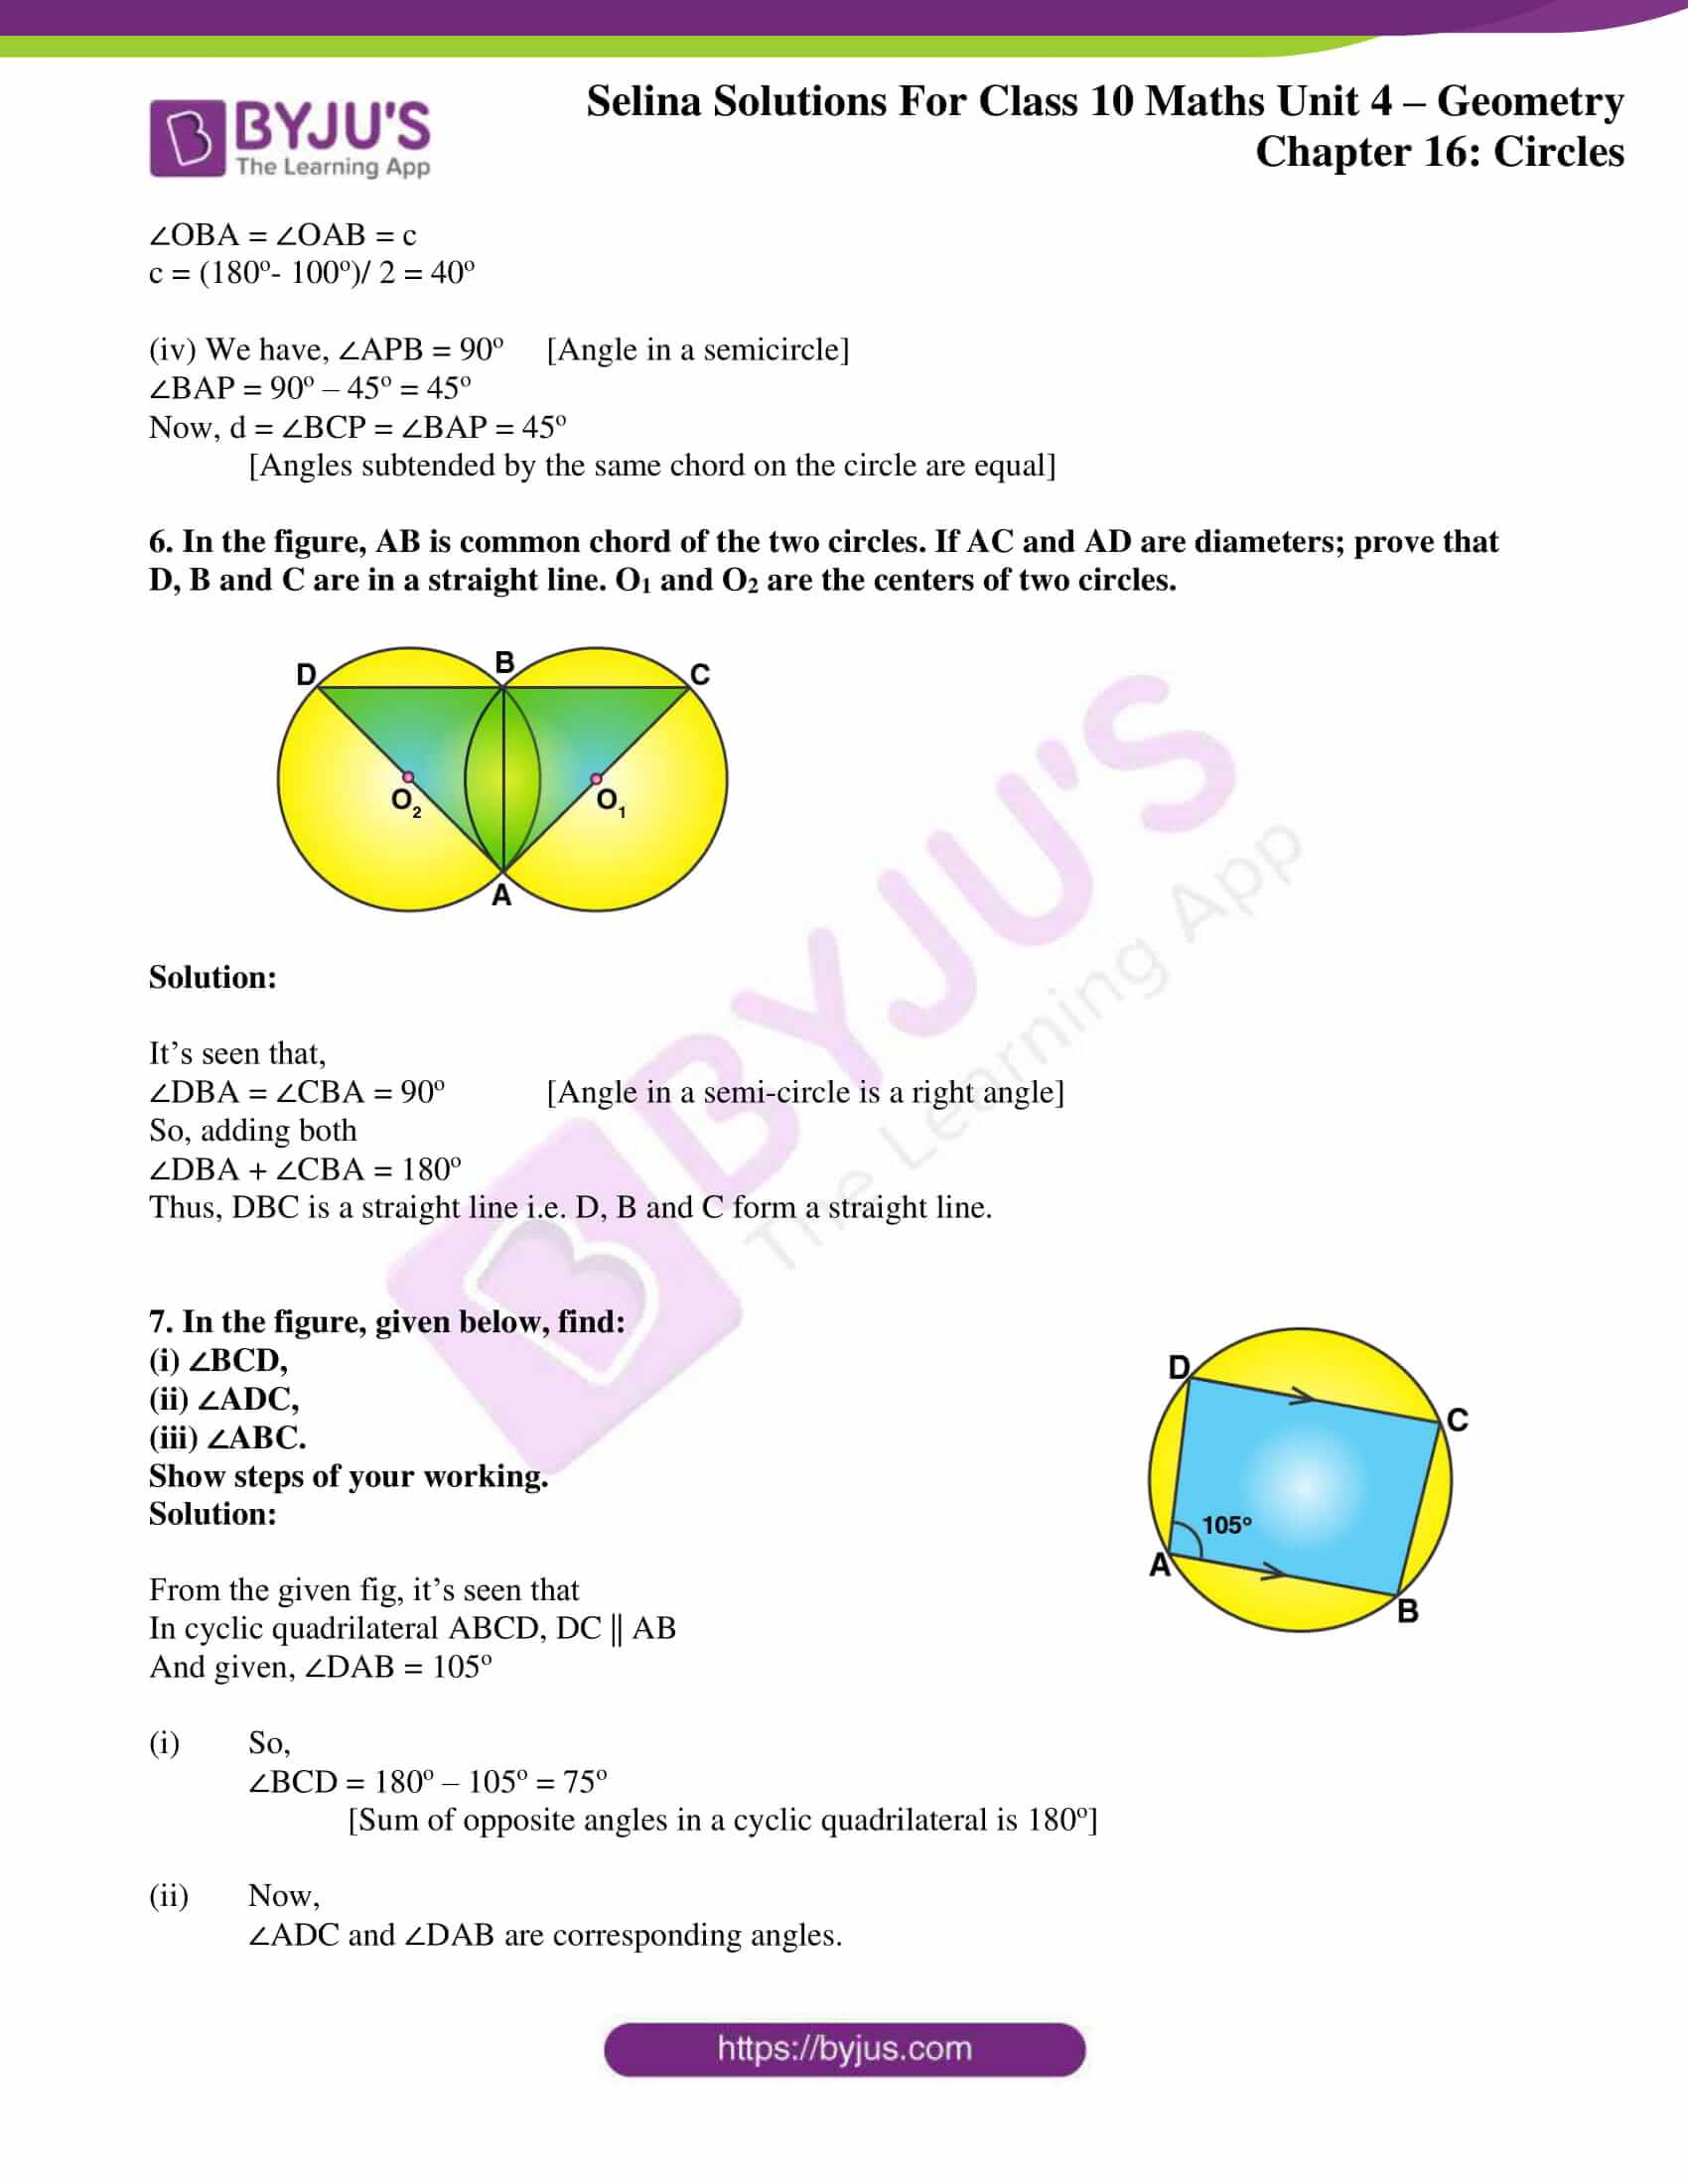 selina-sol-maths-class-10-ch-17-ex-a-04